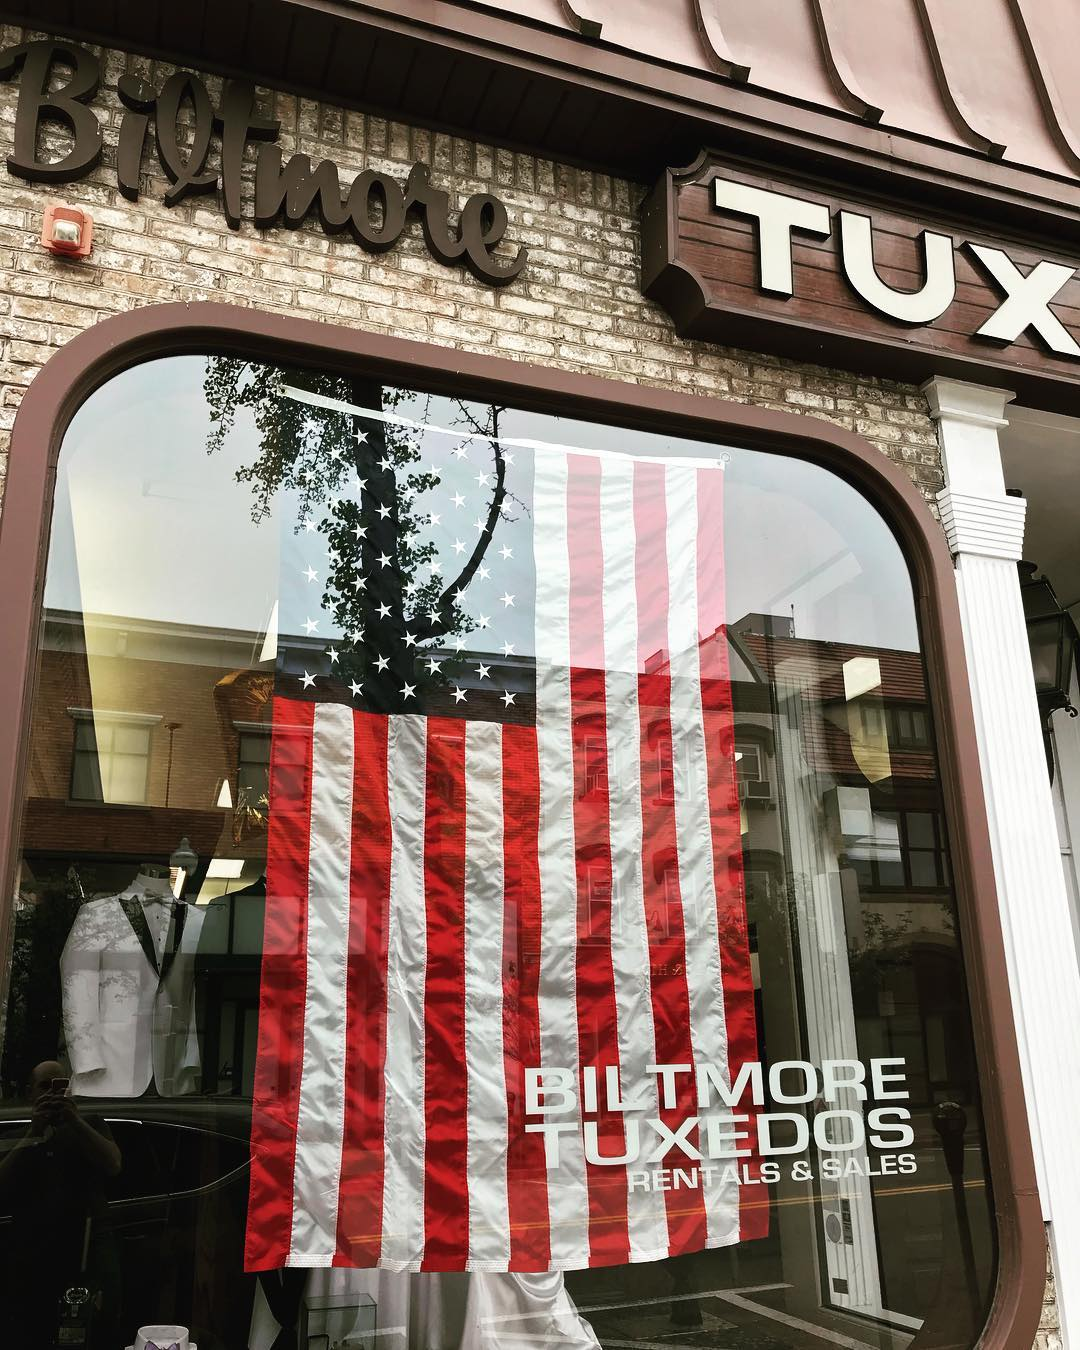 Biltmore Tuxedos in Ridgewood, New Jersey